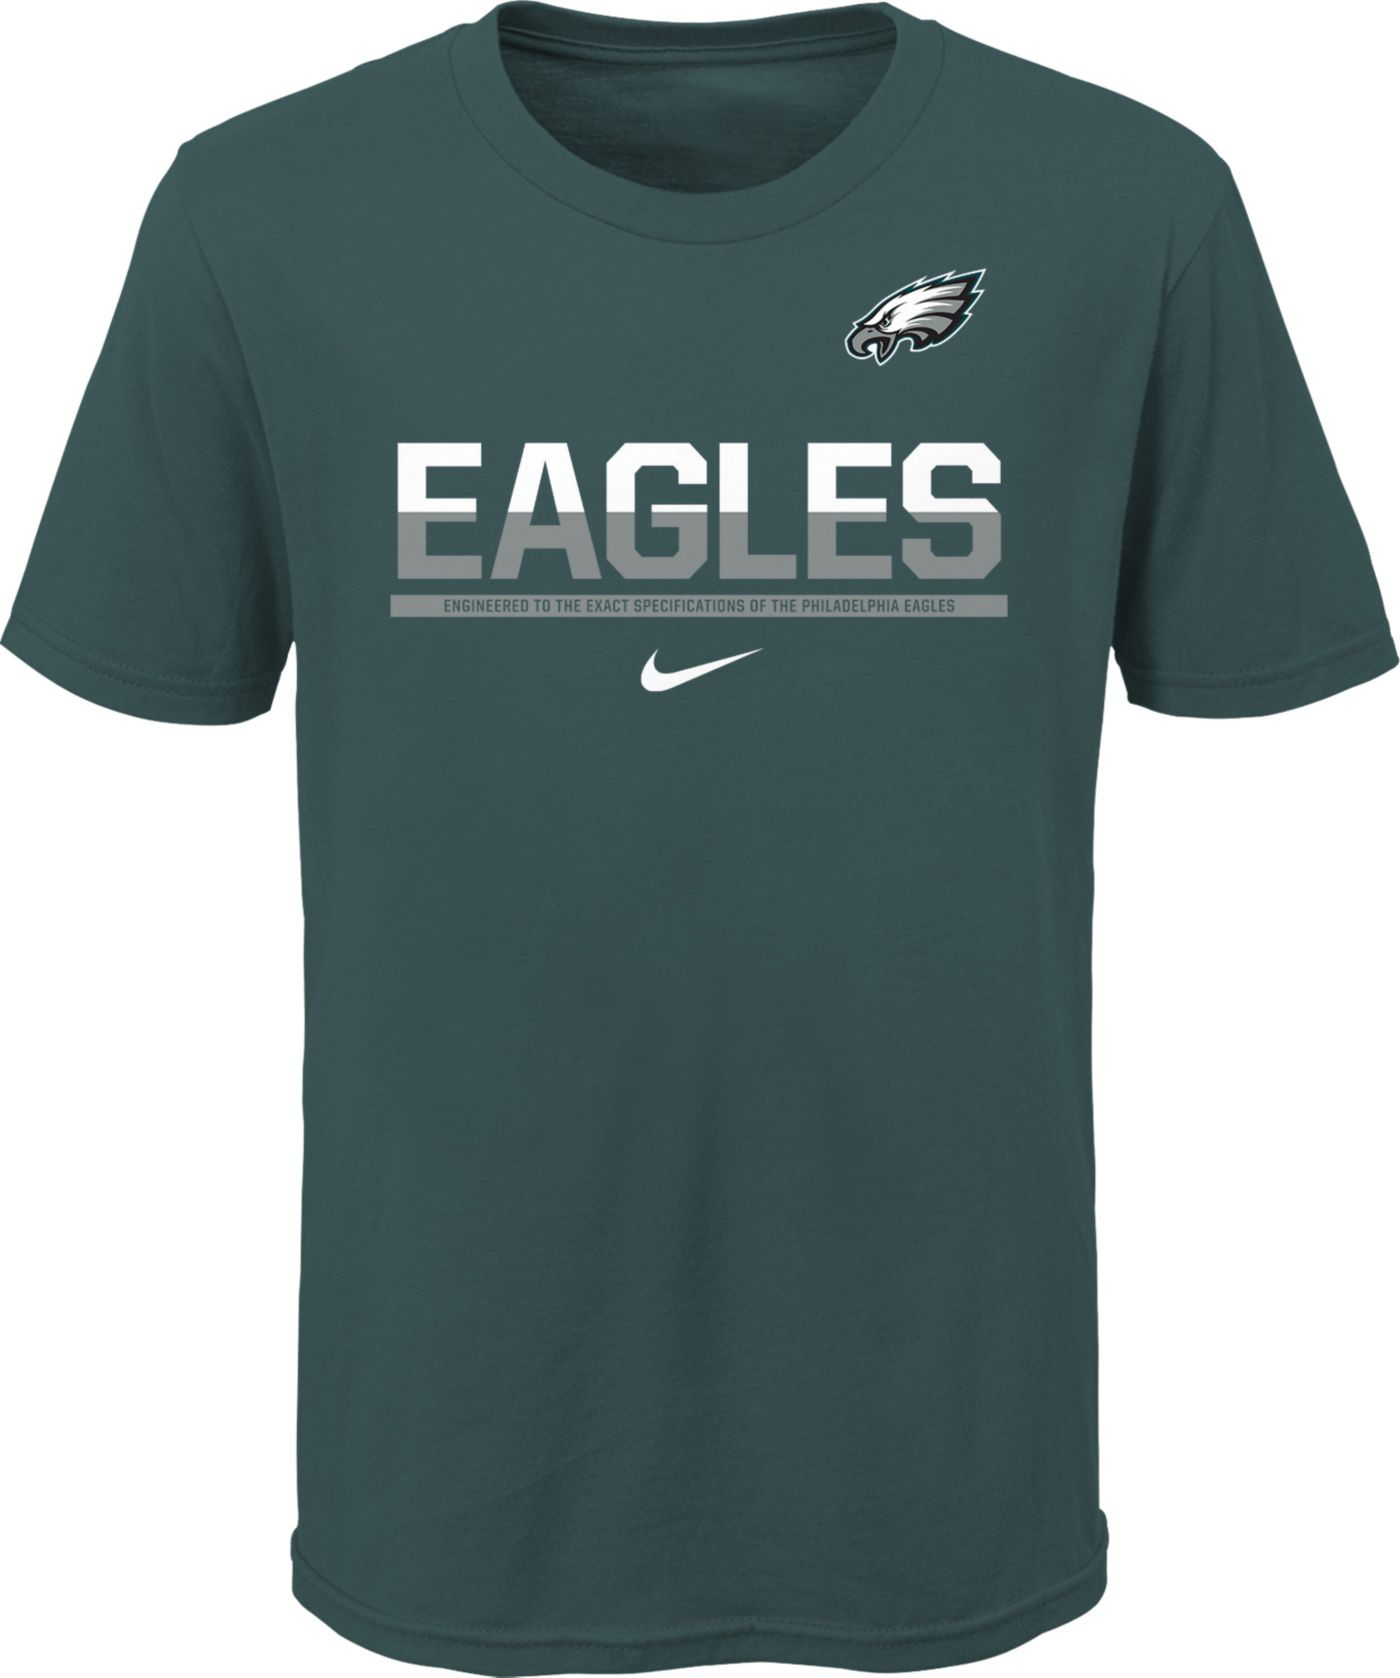 Nike Youth Philadelphia Eagles Team Practice Green T-Shirt